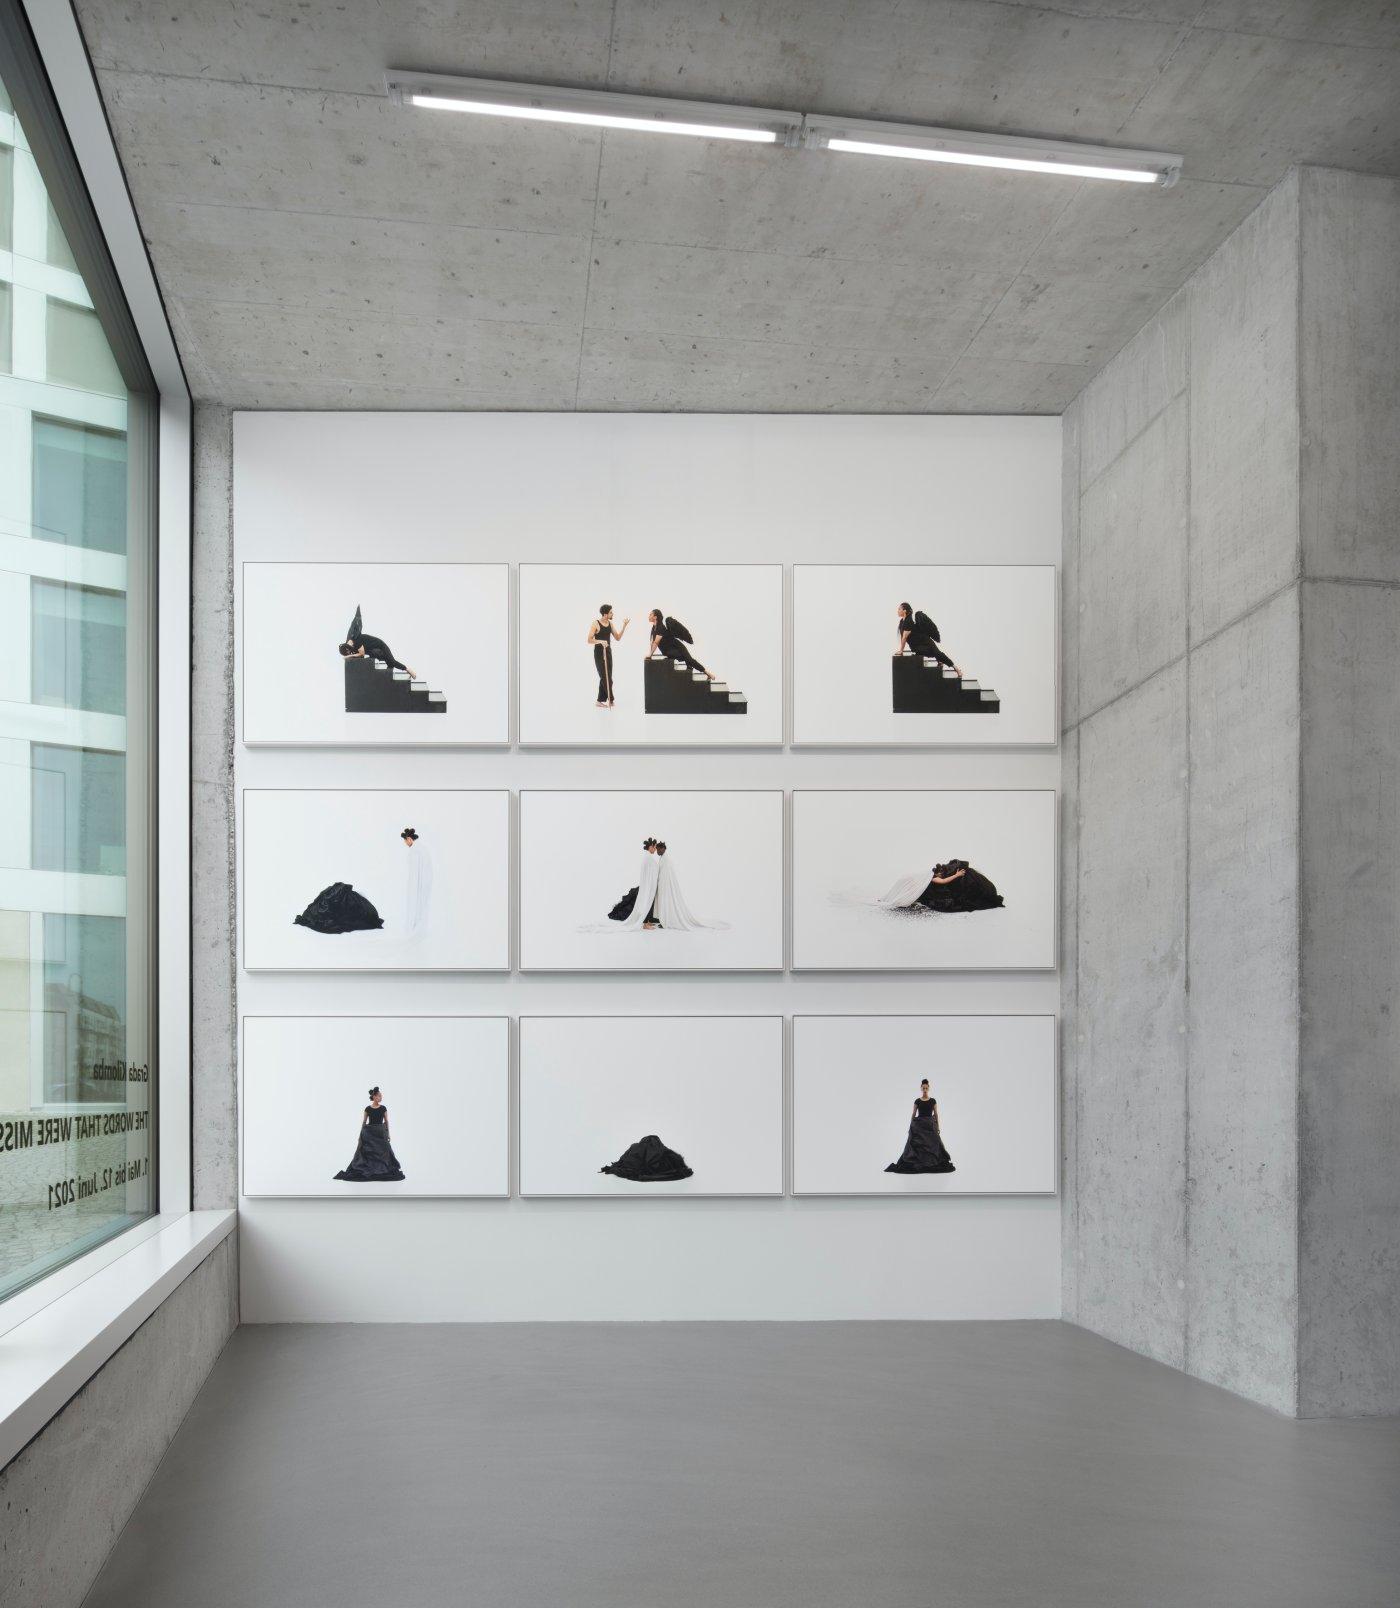 McLaughlin Gallery Grada Kilomba 3